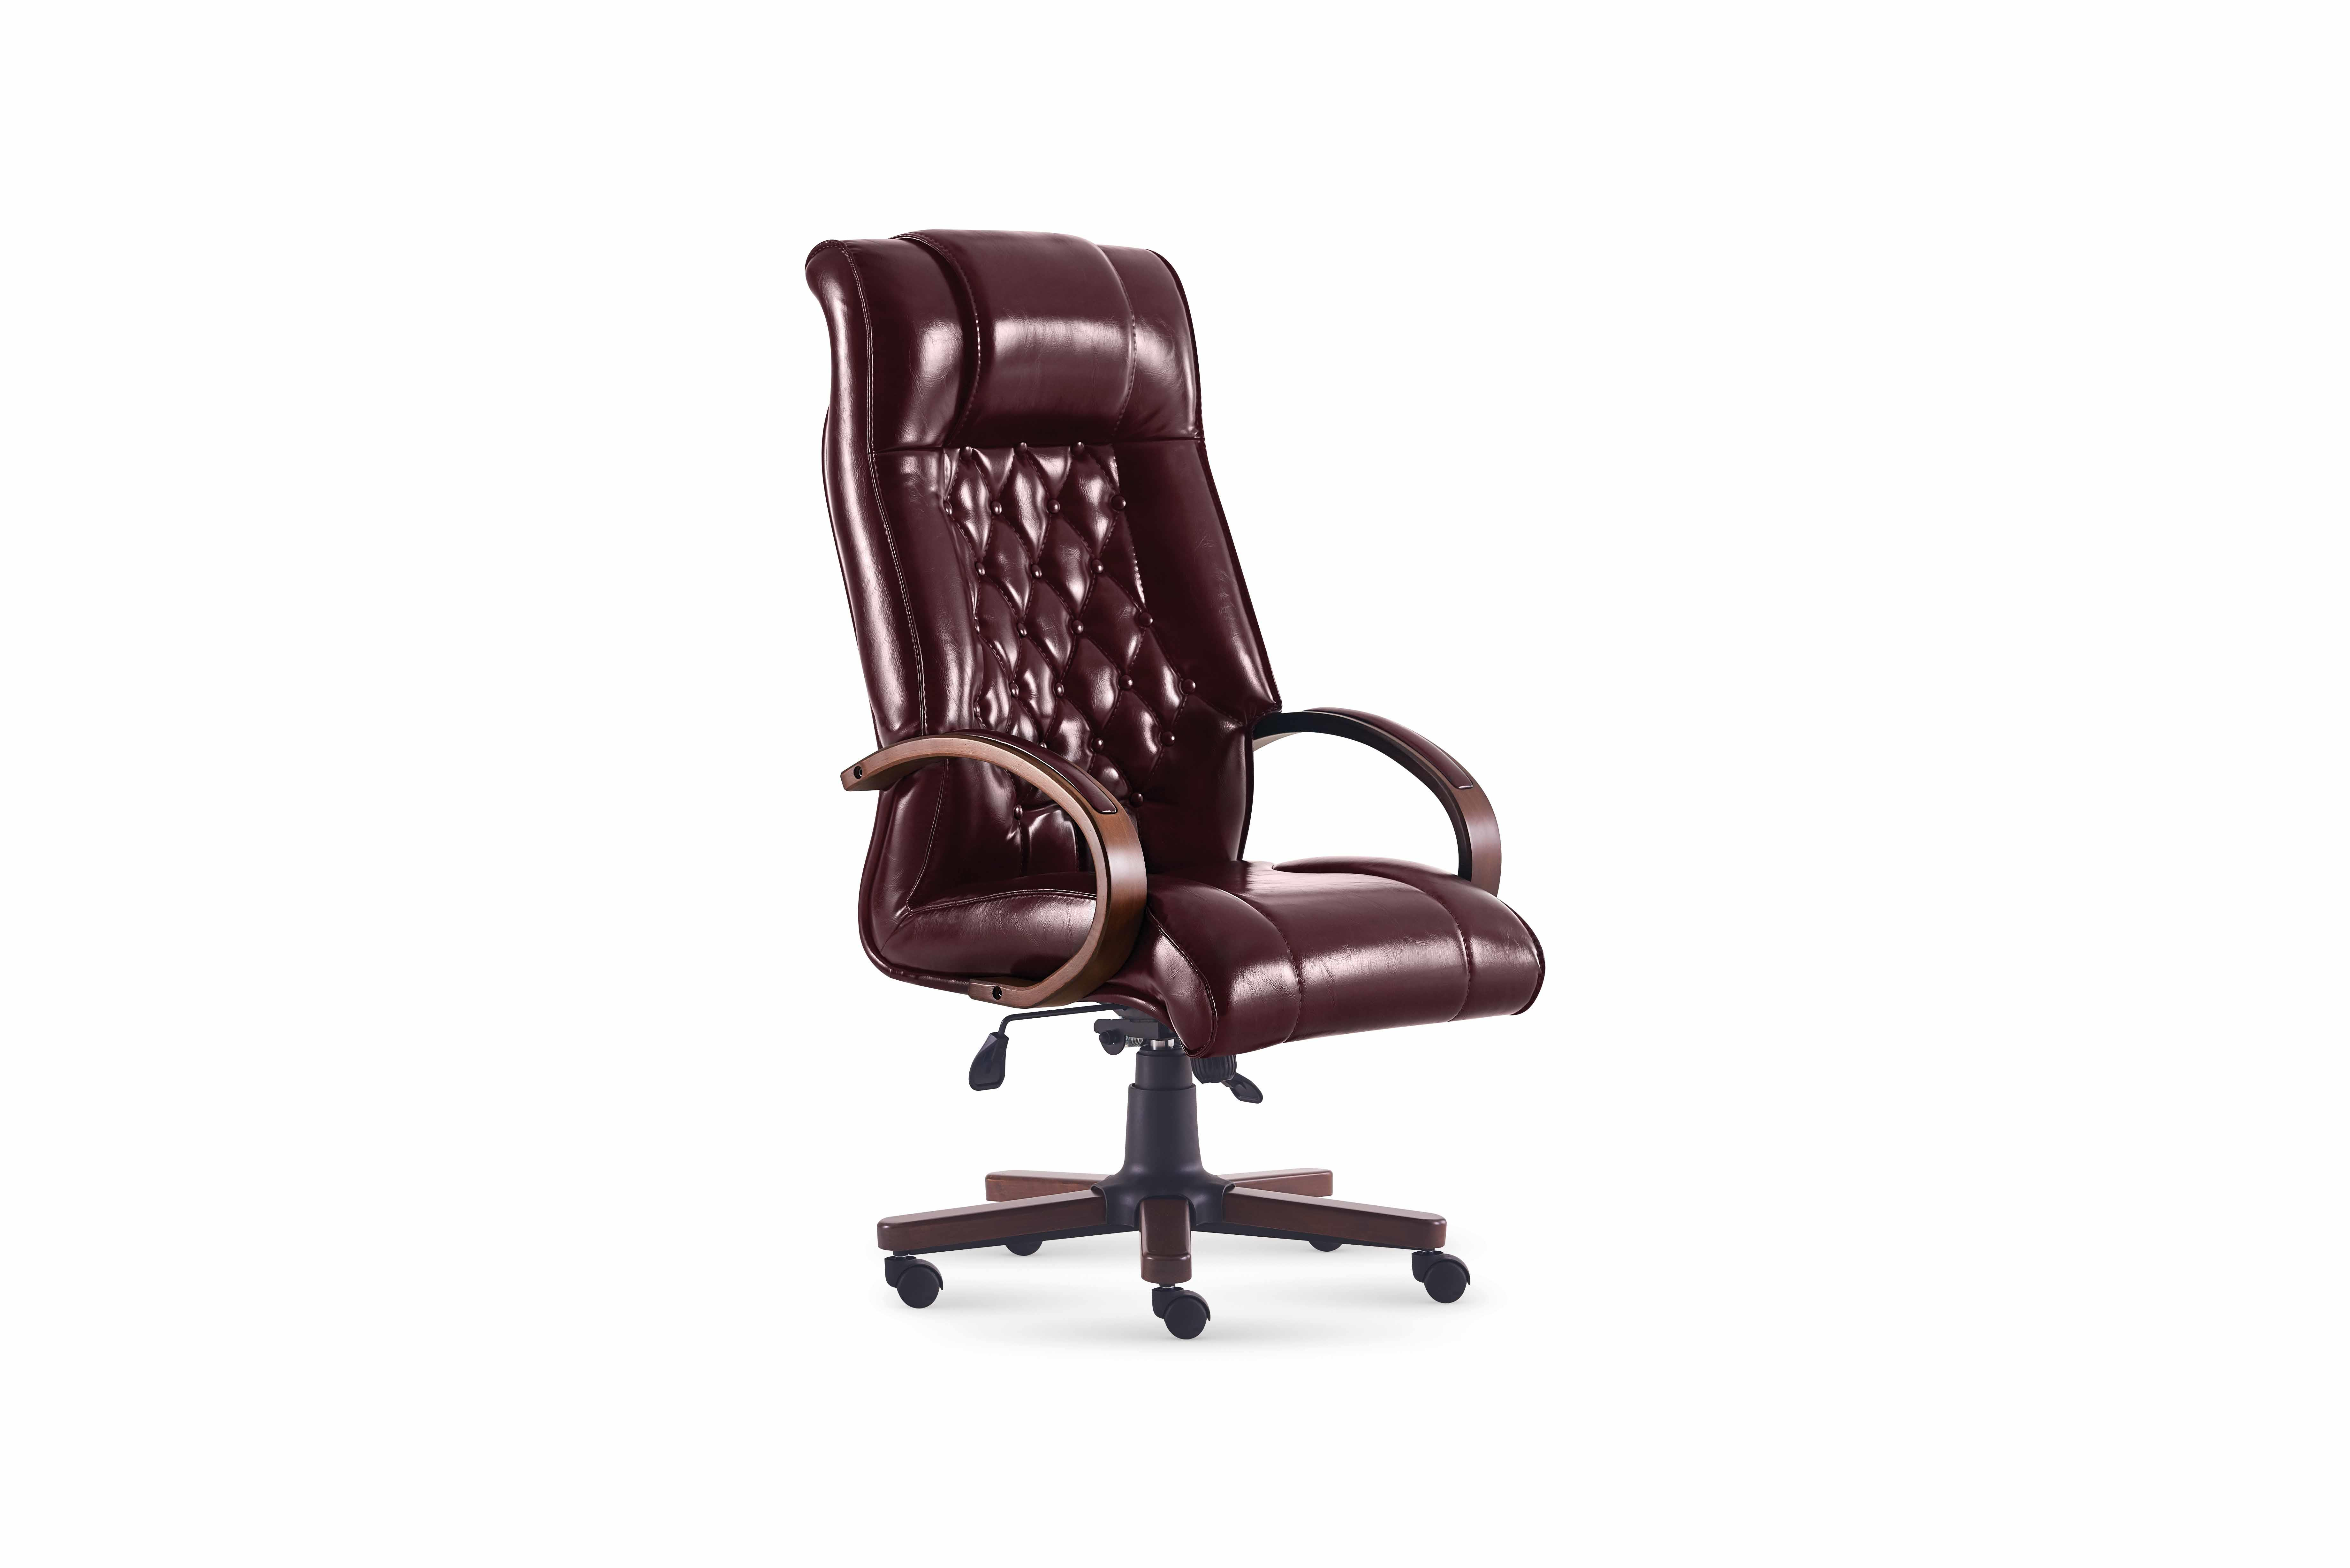 Office Work Chair